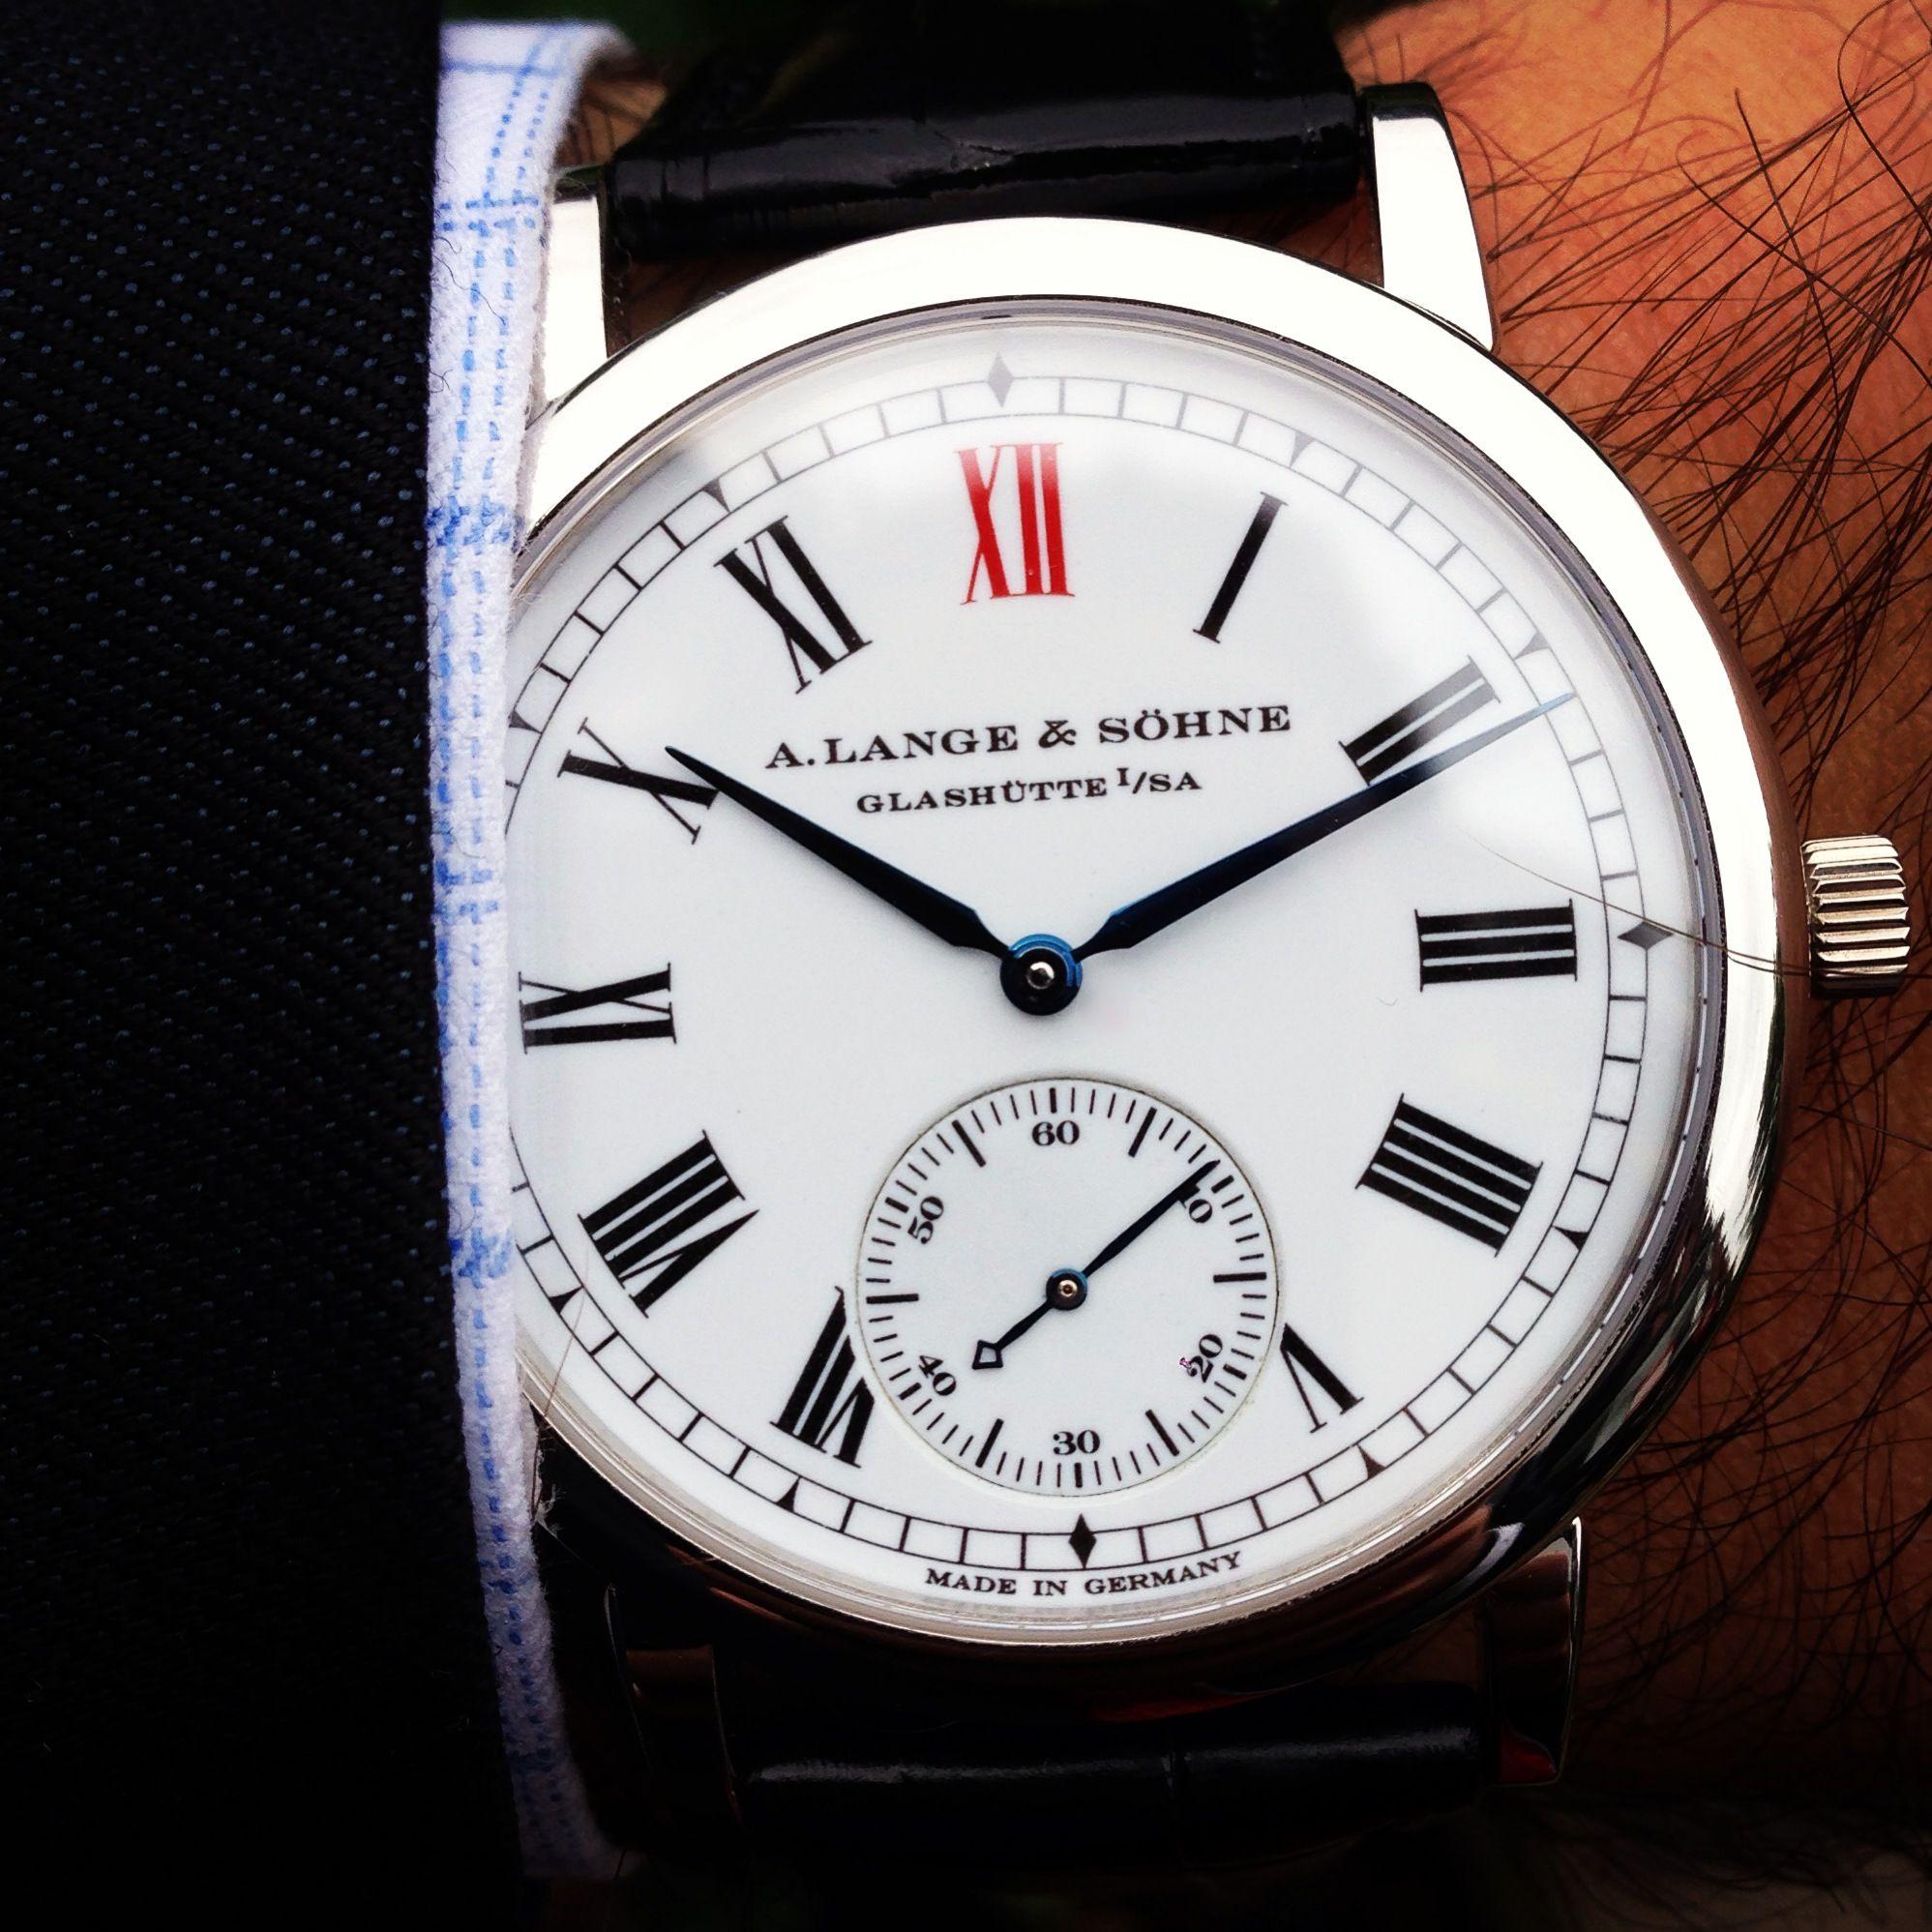 Pin By Rodrigo Lobato On Men S Watches Watches For Men